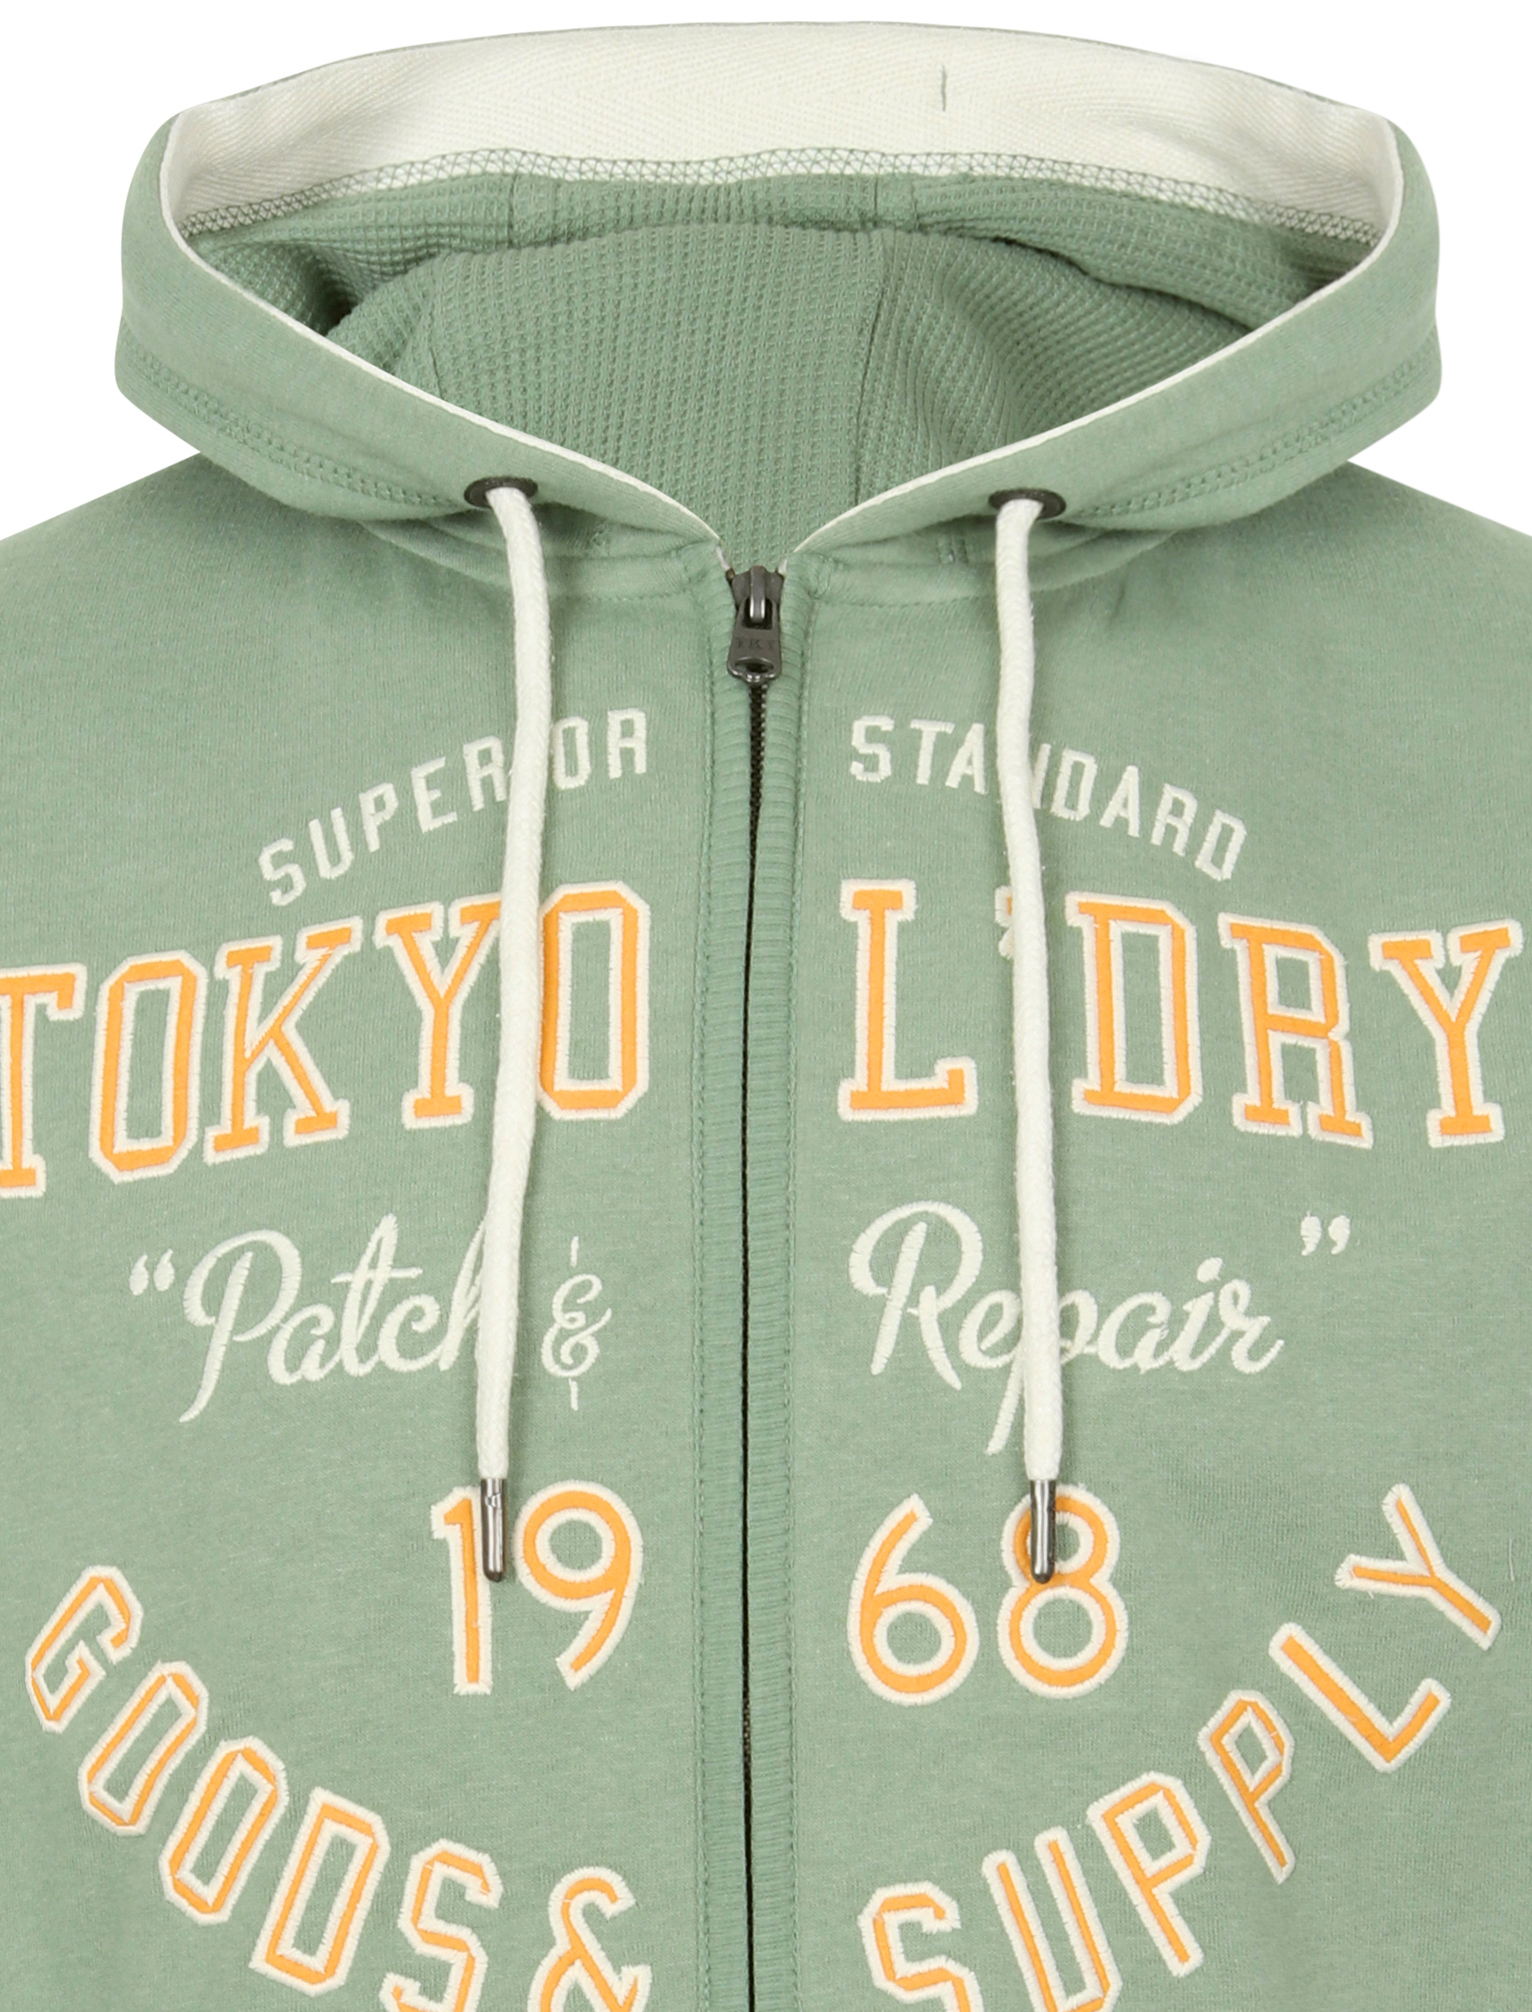 Tokyo-Laundry-Men-039-s-Harper-Zip-Up-Hoodie-Hooded-Top-Sweatshirt-Sweater-Jacket thumbnail 12